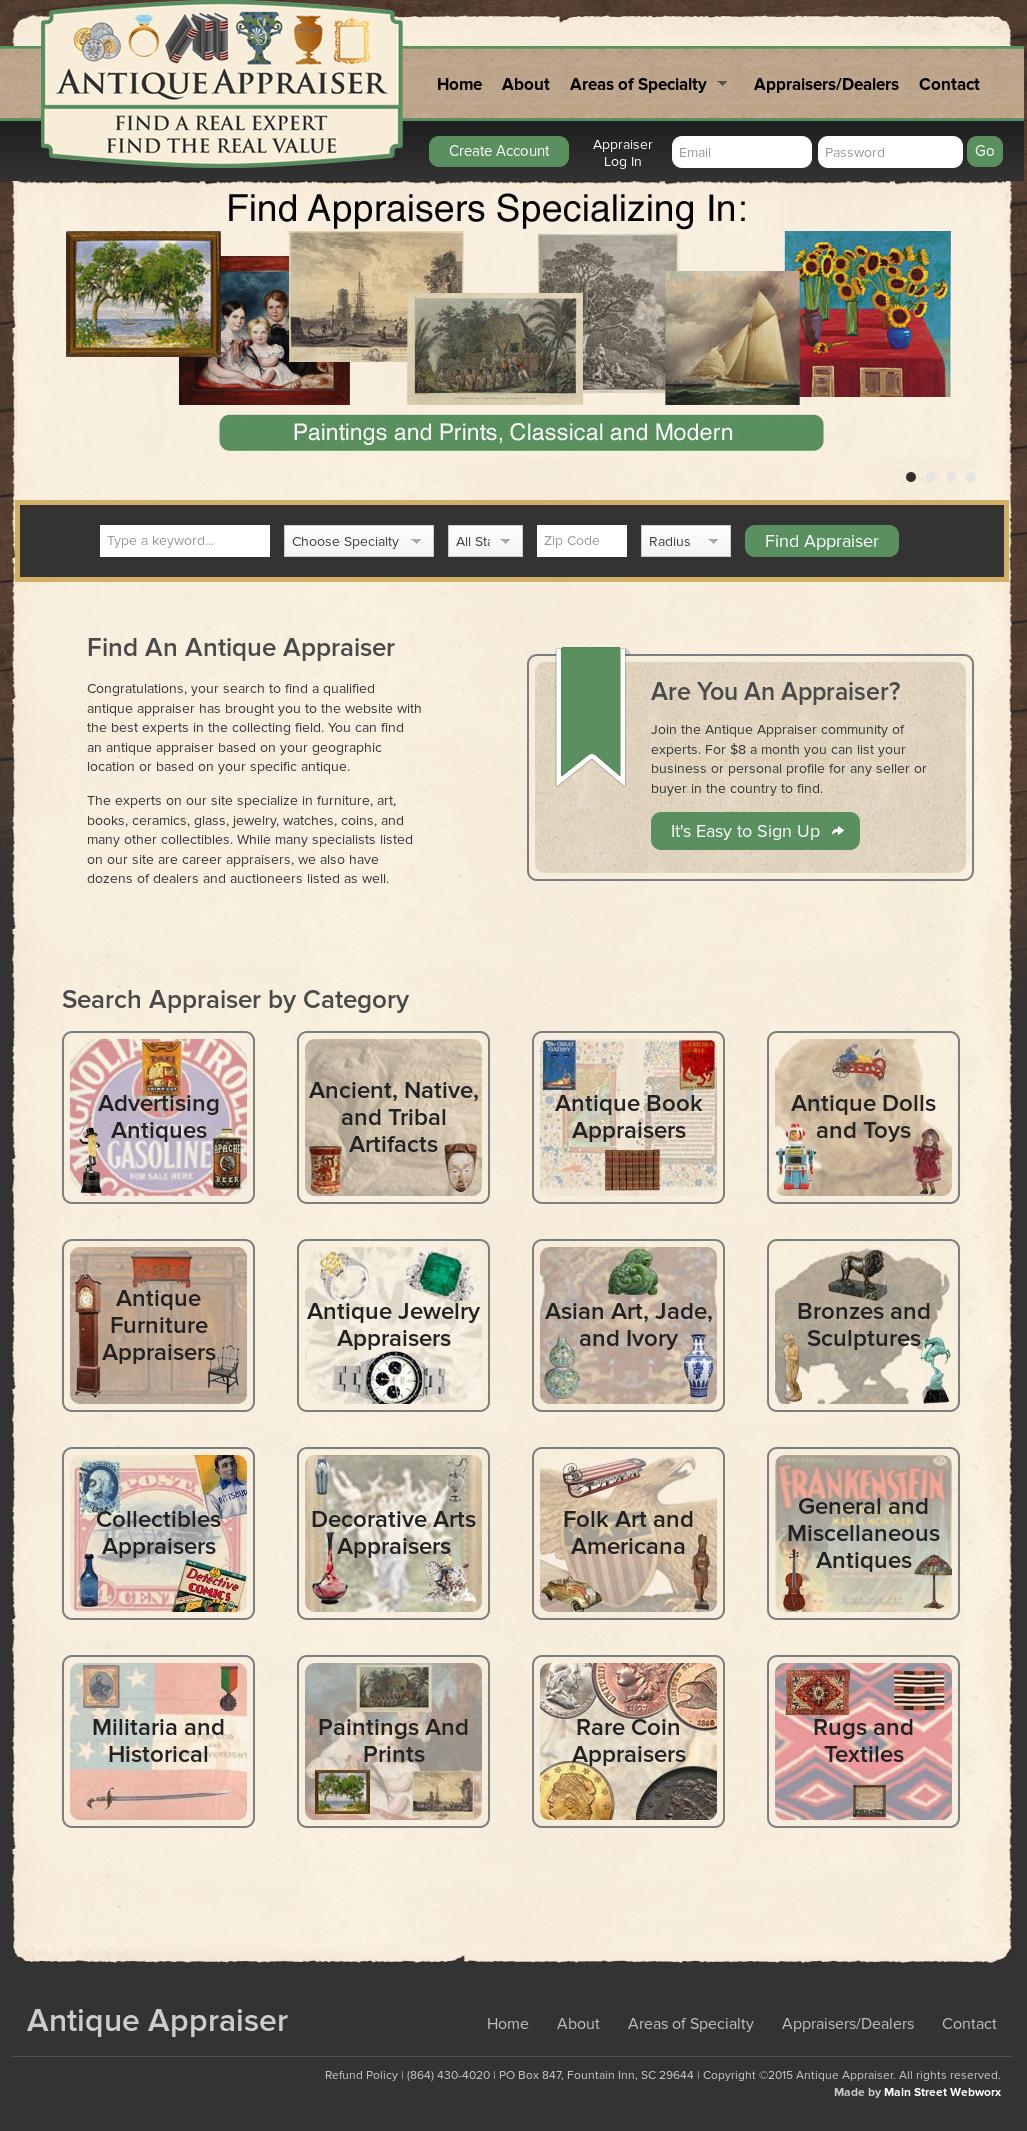 Antique Appraiser Competitors, Revenue and Employees - Owler Company Profile - Antique Appraiser Competitors, Revenue And Employees - Owler Company